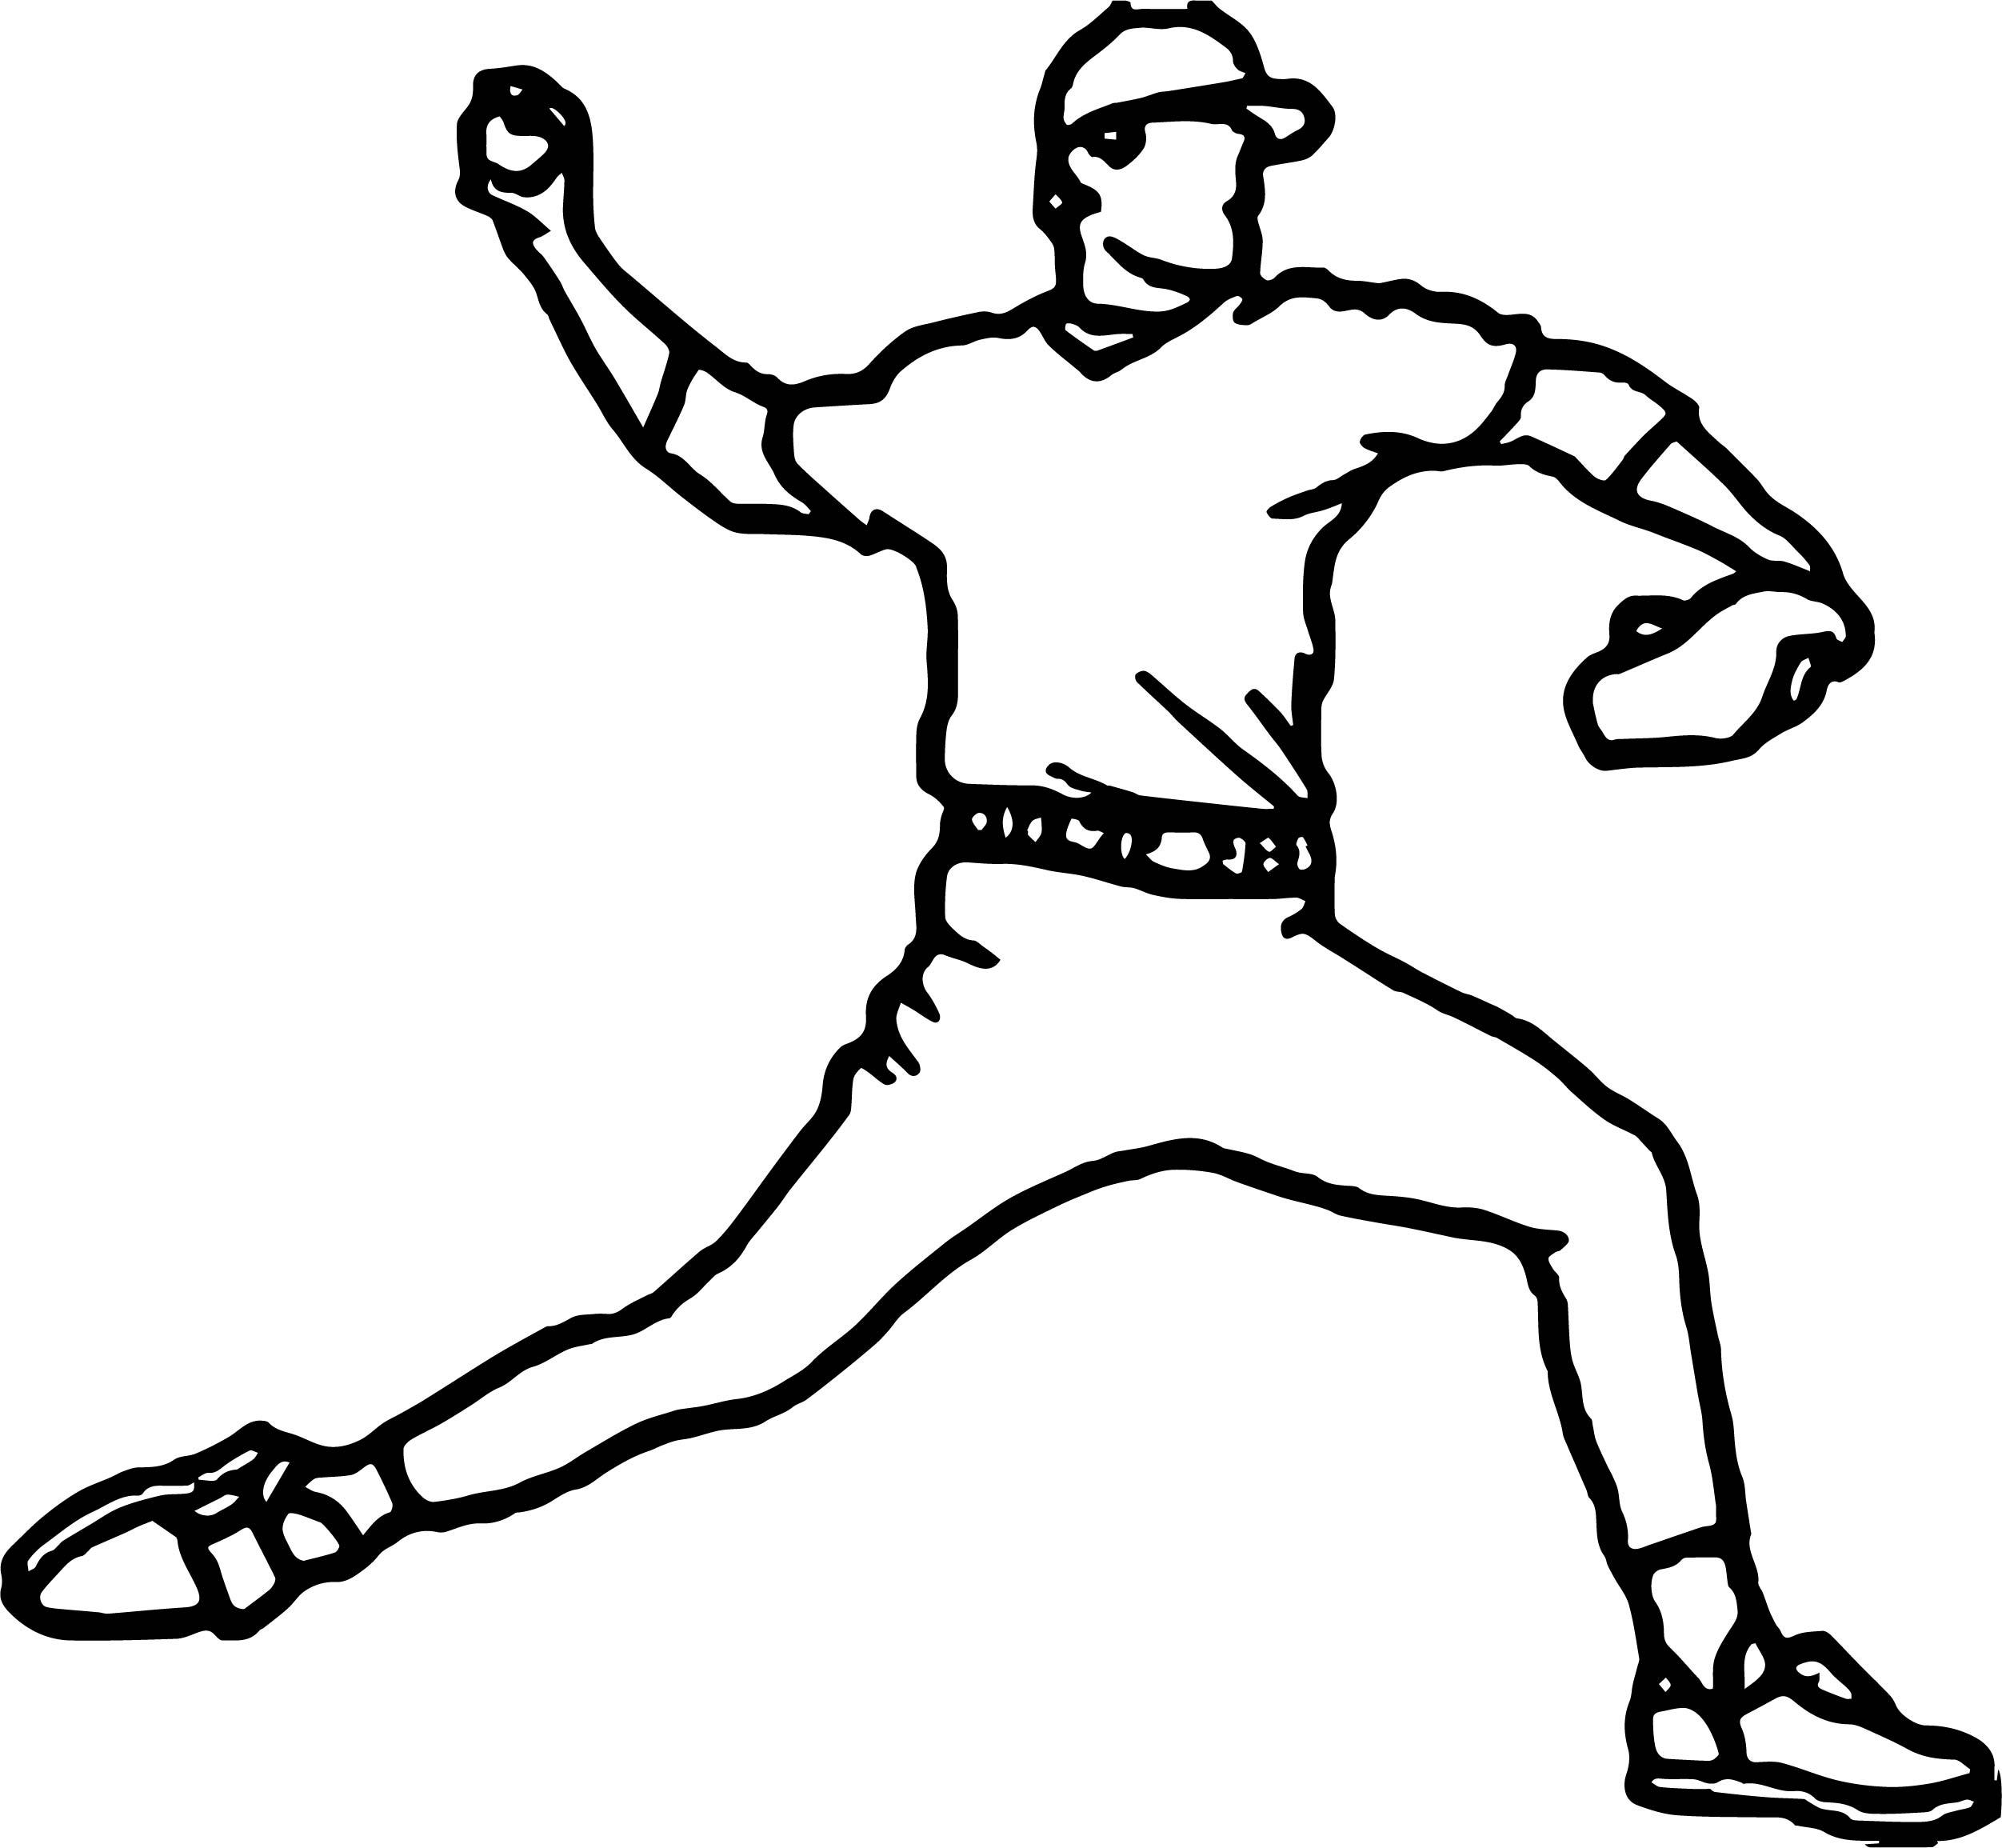 2503x2310 Baseball Pitcher Playing Baseball Coloring